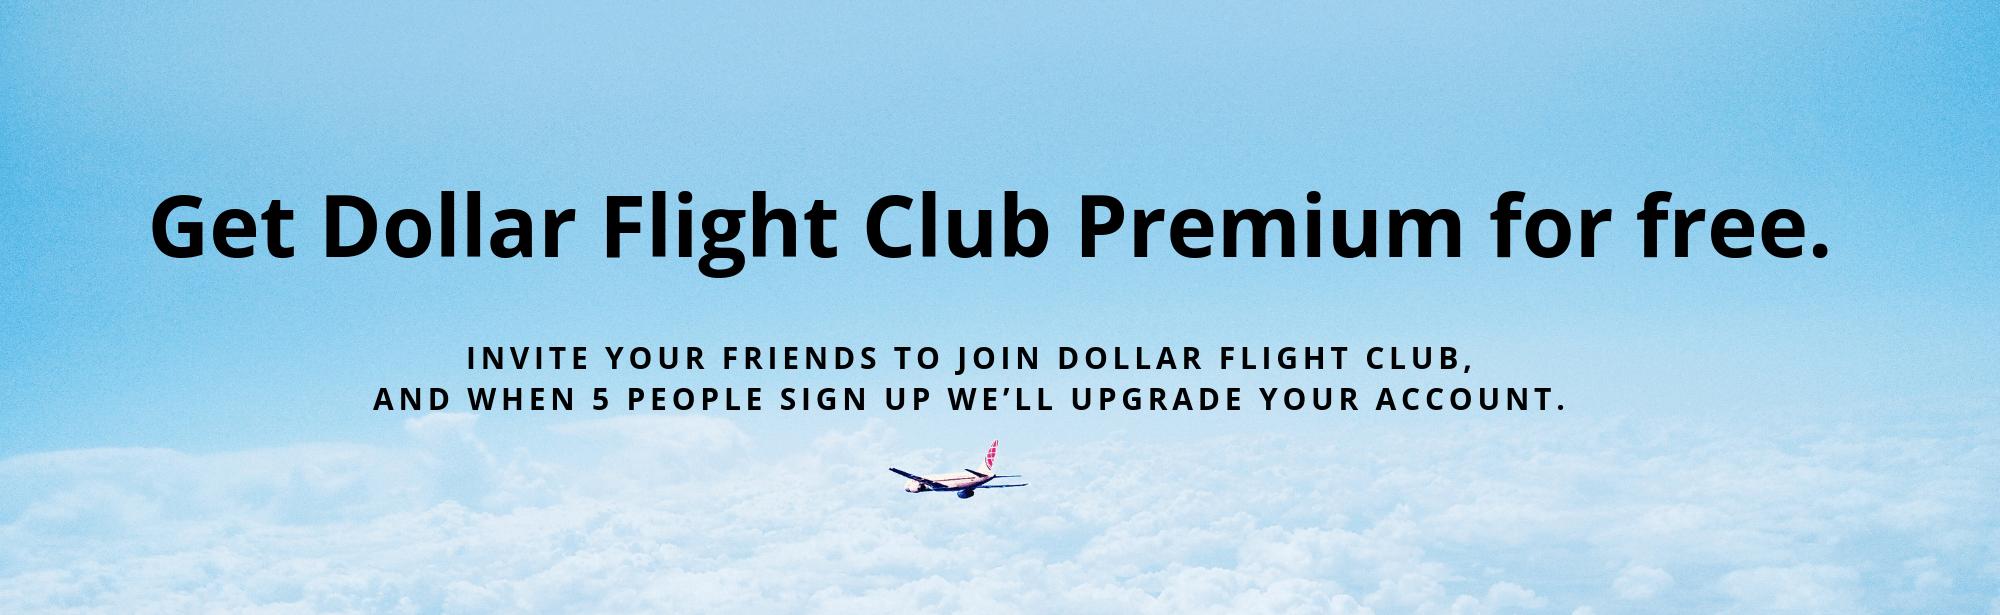 Dollar Flight Club Referral Program